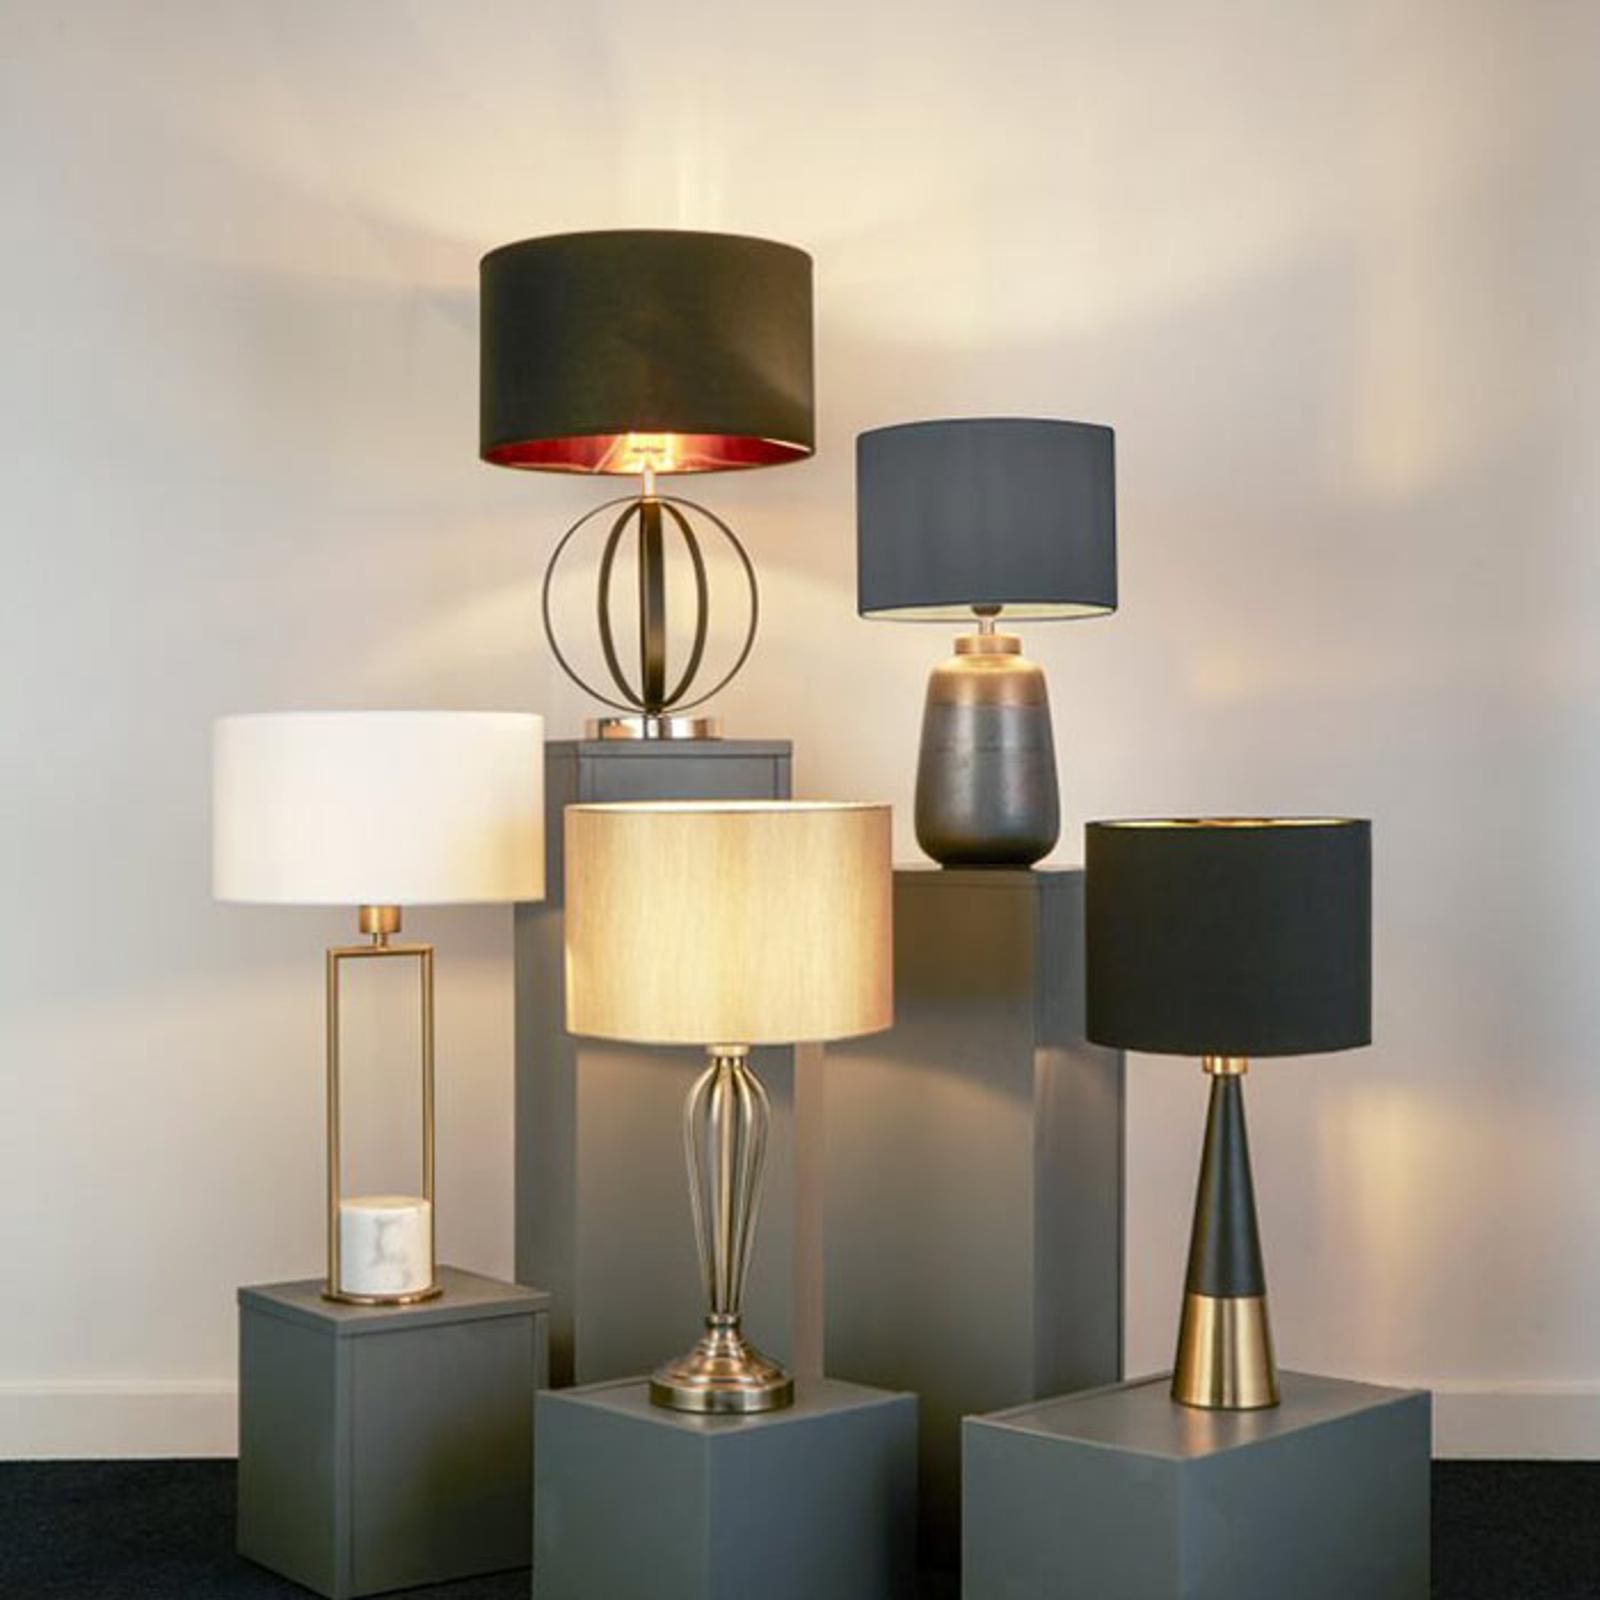 Tafellamp Pyramid, zwart-koper